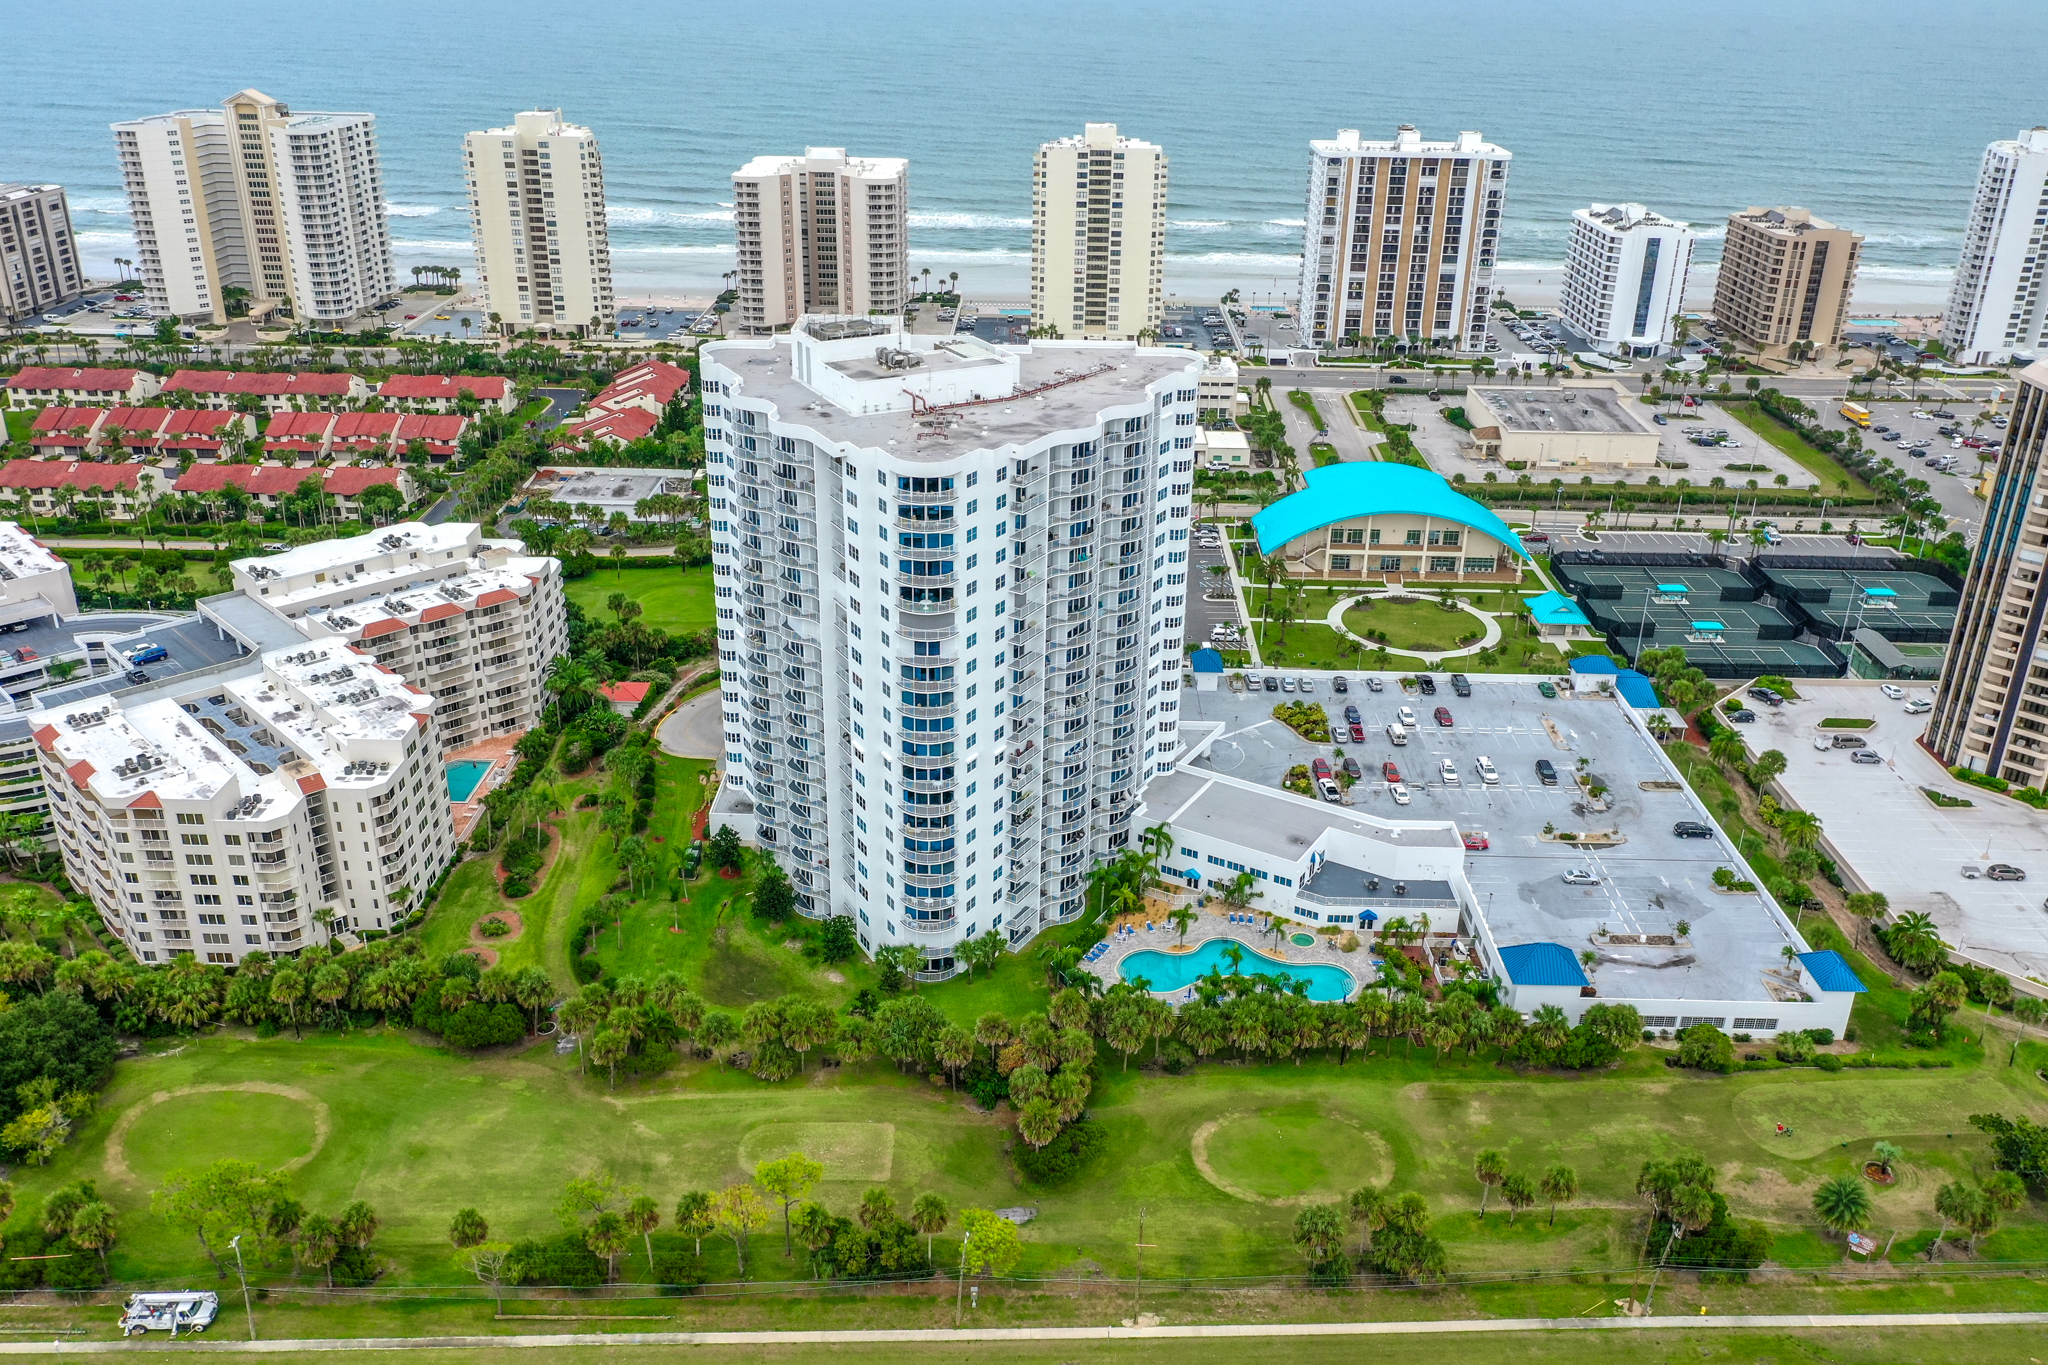 Photo of oceanfront condo buildings